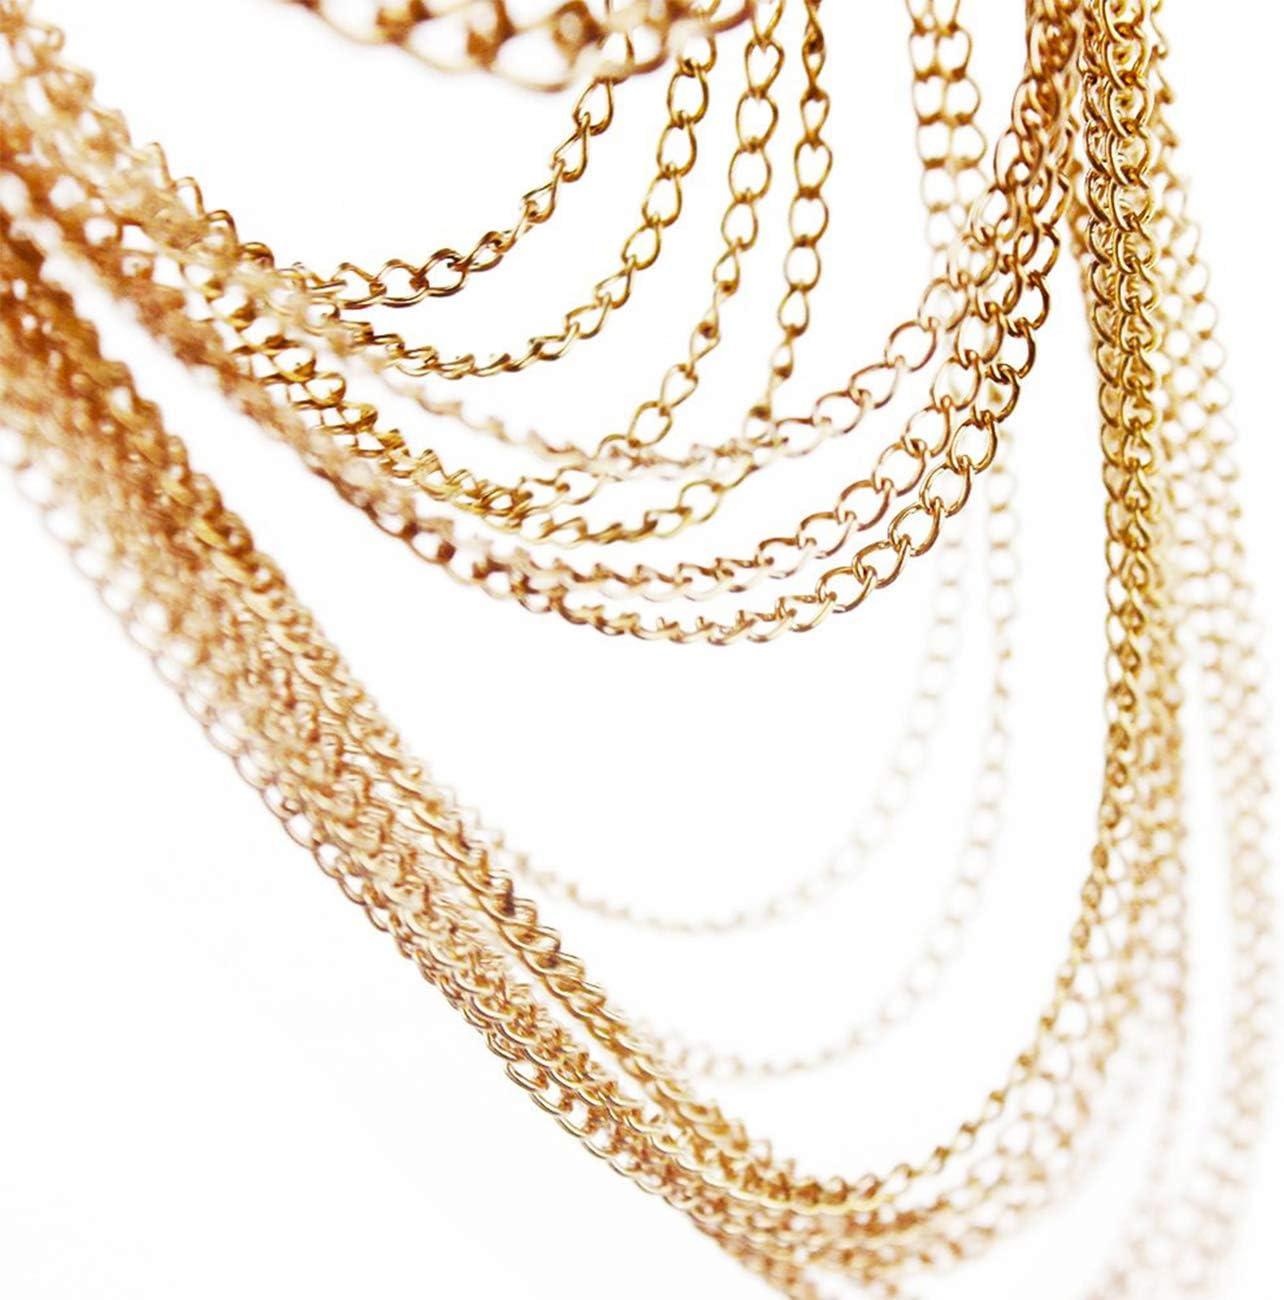 Yomiie Body Shoulder Chain Multilayered Sexy Gold Tassels Beads Link Harness Necklace Fashion Jewelry Belly Waist Bra Love Rocks Hot Bikini Beach Birthday Anniversary Festival Gift for Women Girls